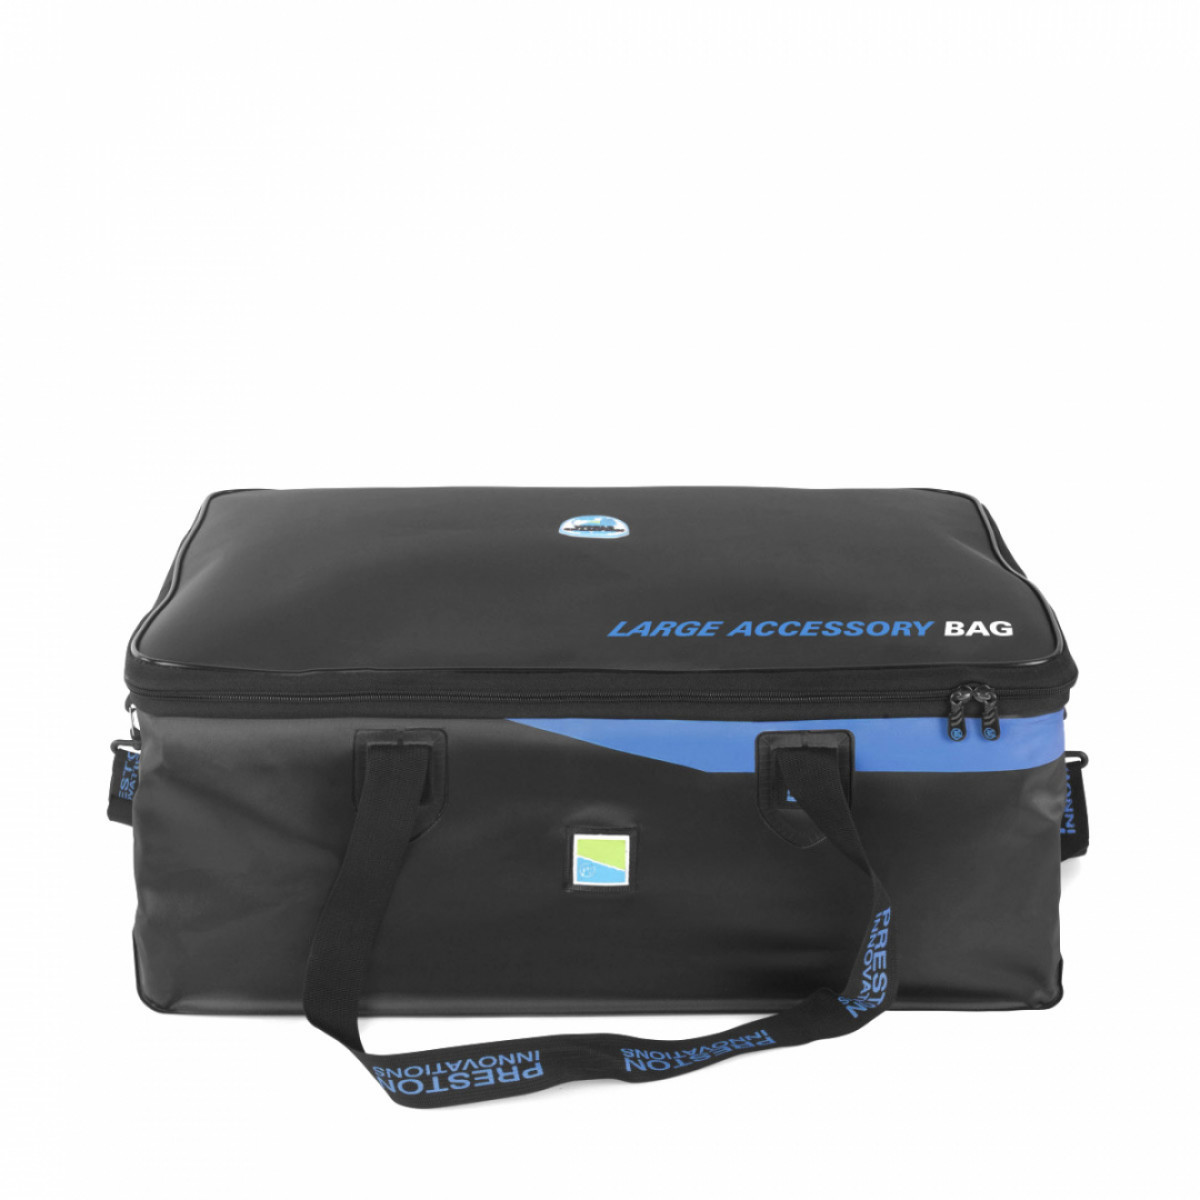 World Champion Large Accessory Bag